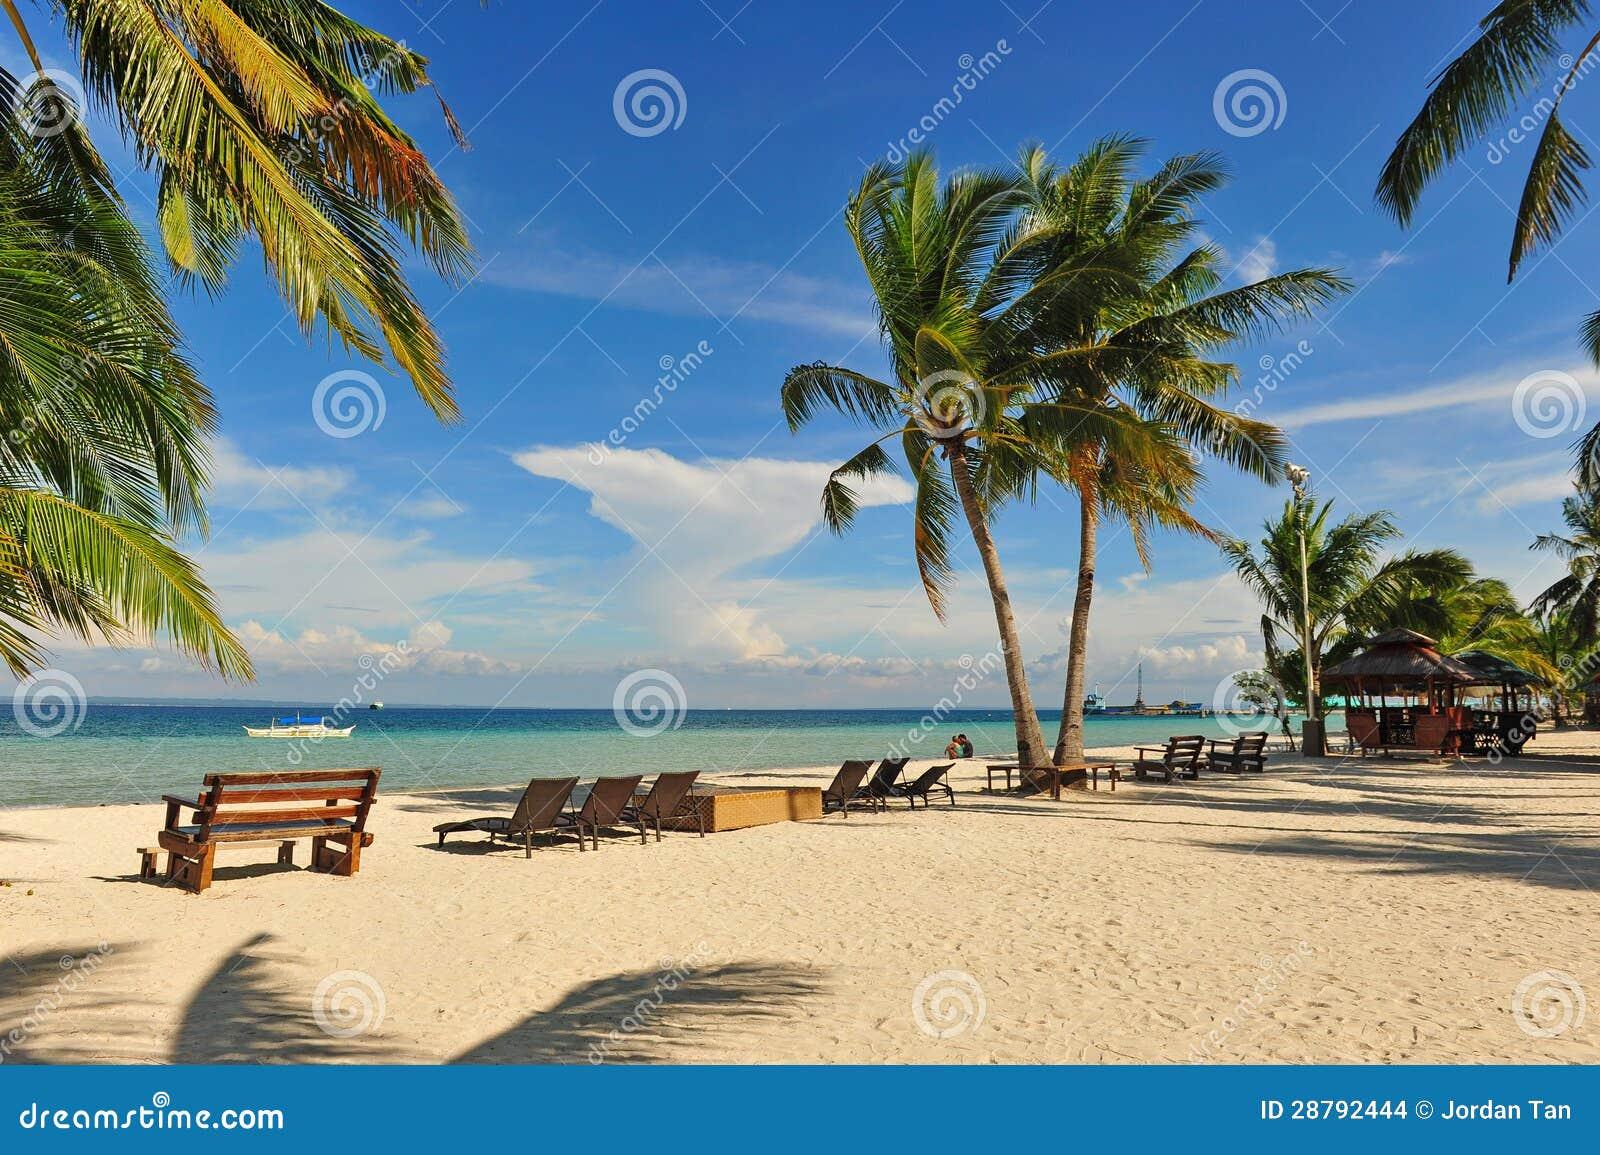 Palm Beach Tan Prices >> Beautiful Beach Resort At Bantayan Island, Cebu Stock Photo - Image: 28792444